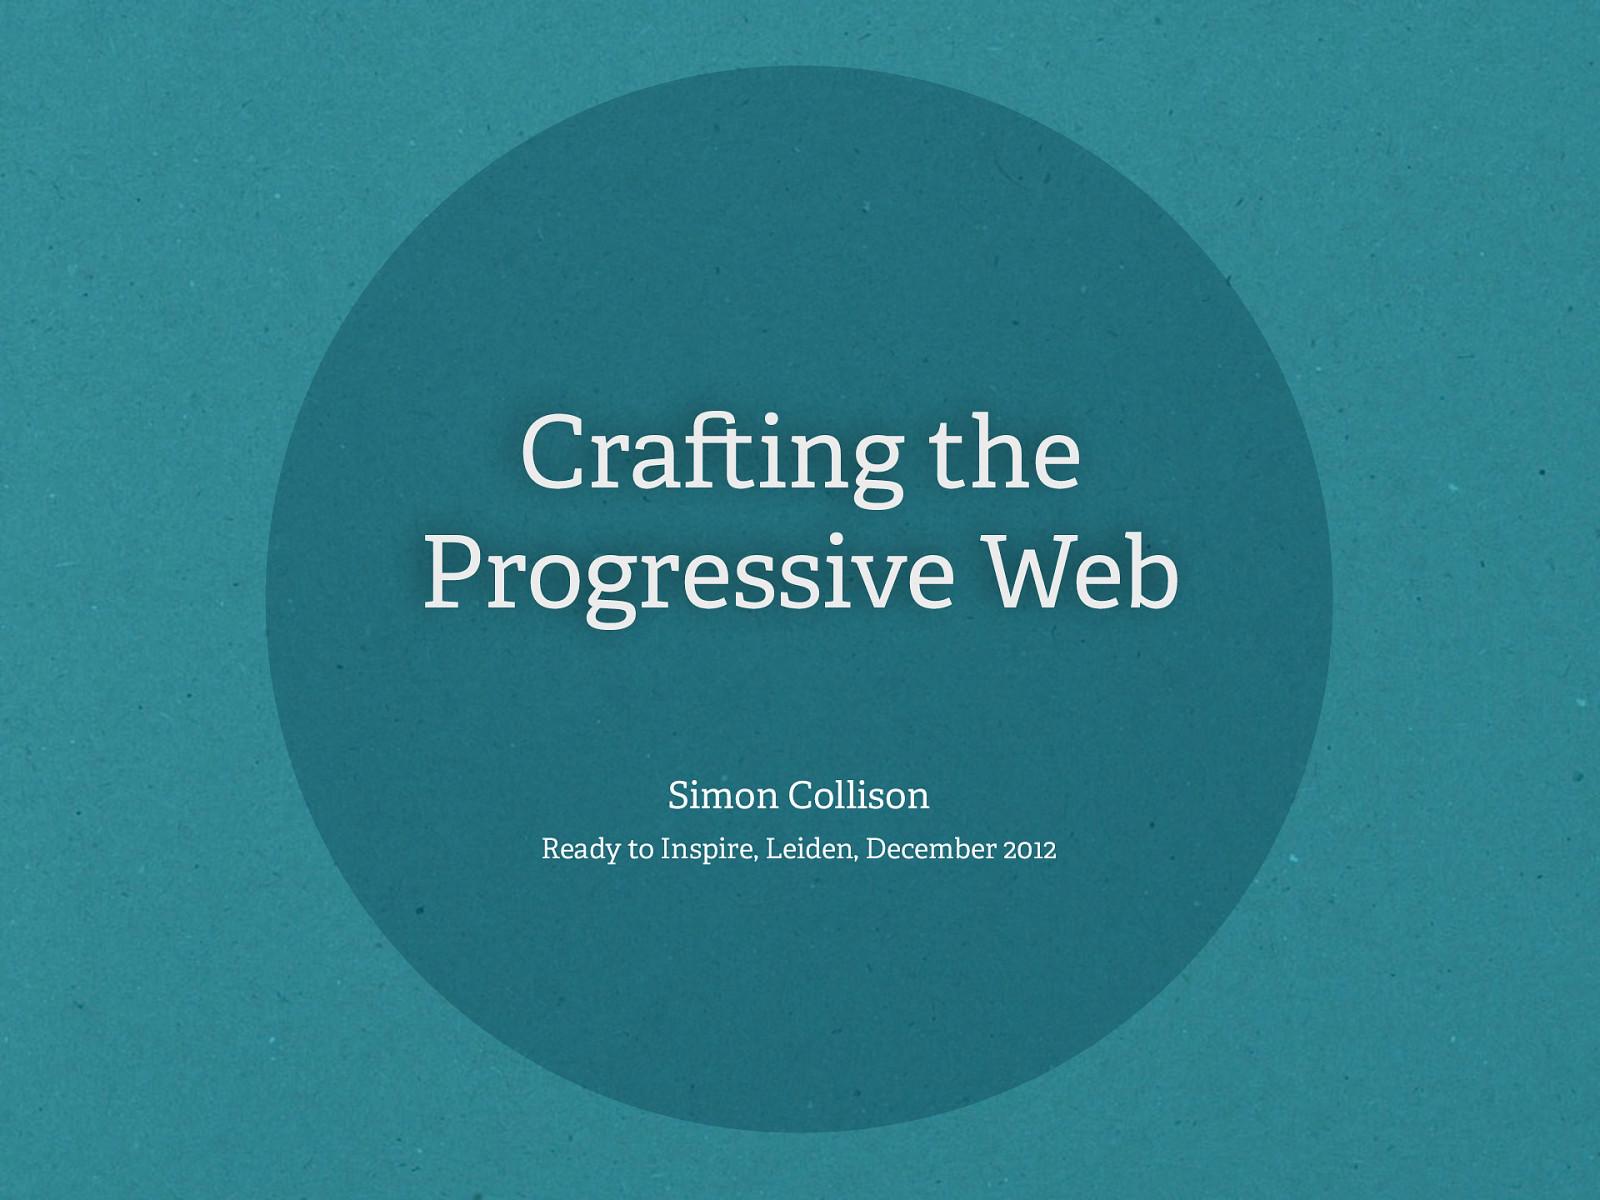 Crafting the Progressive Web